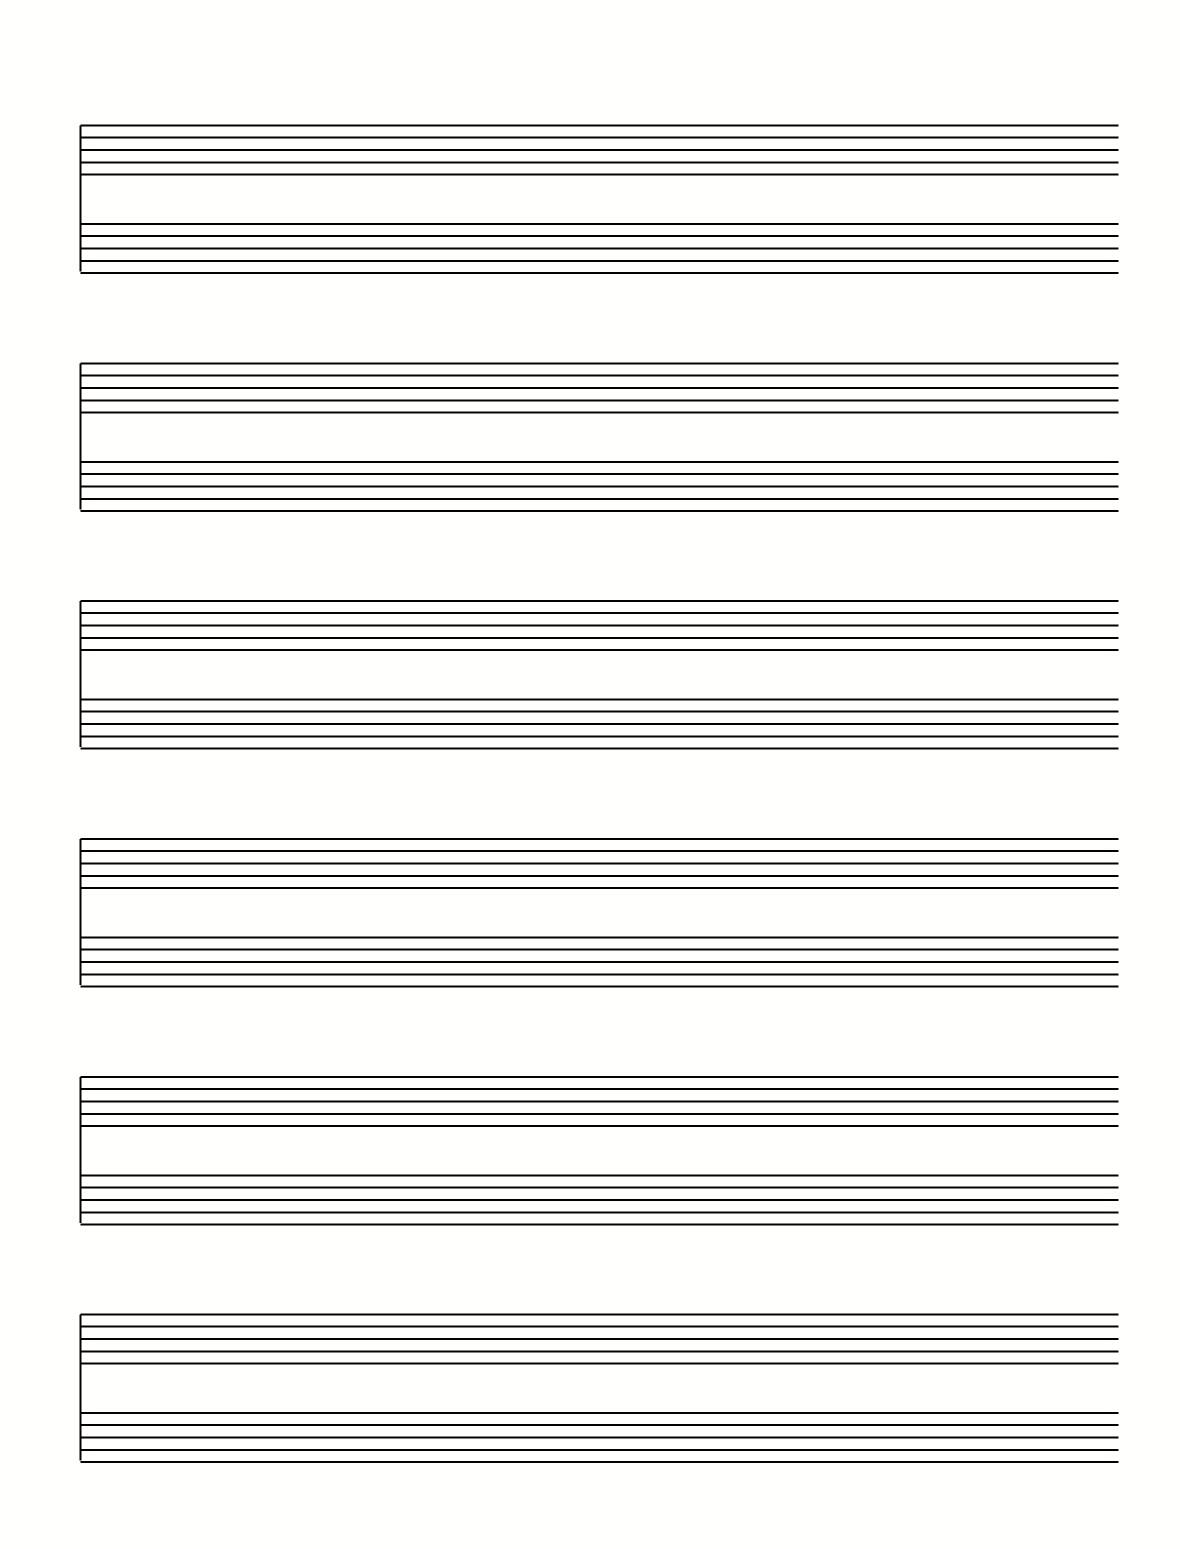 Score Tablature Free Template Download Pdf Mando Montréal